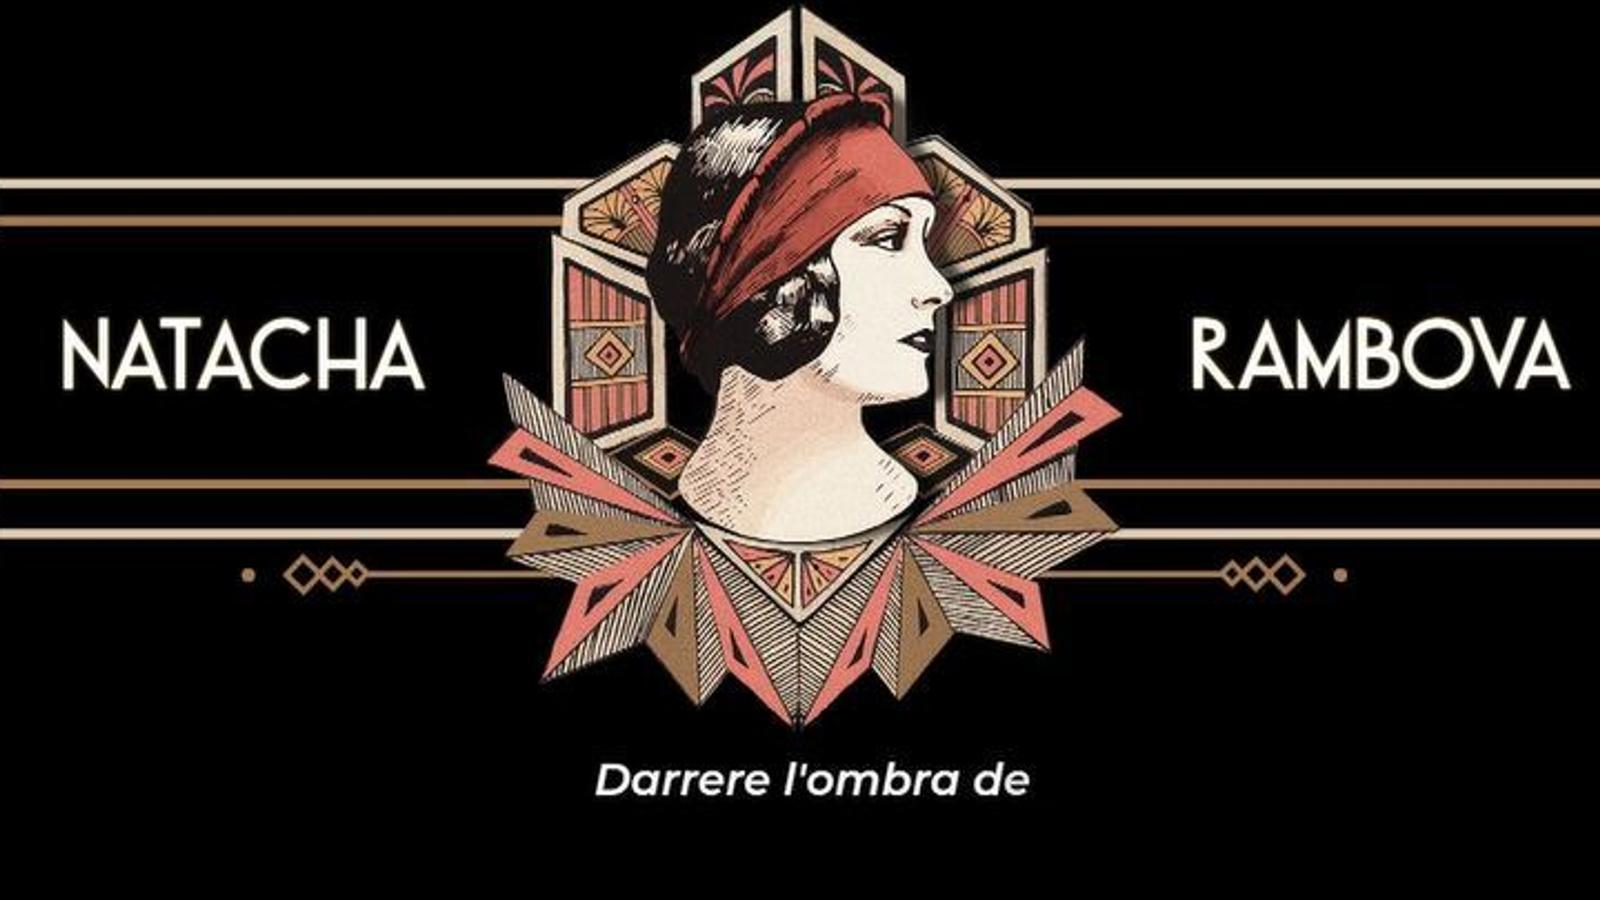 Tràiler del documental 'Darrere l'ombra de Natacha Rambova'